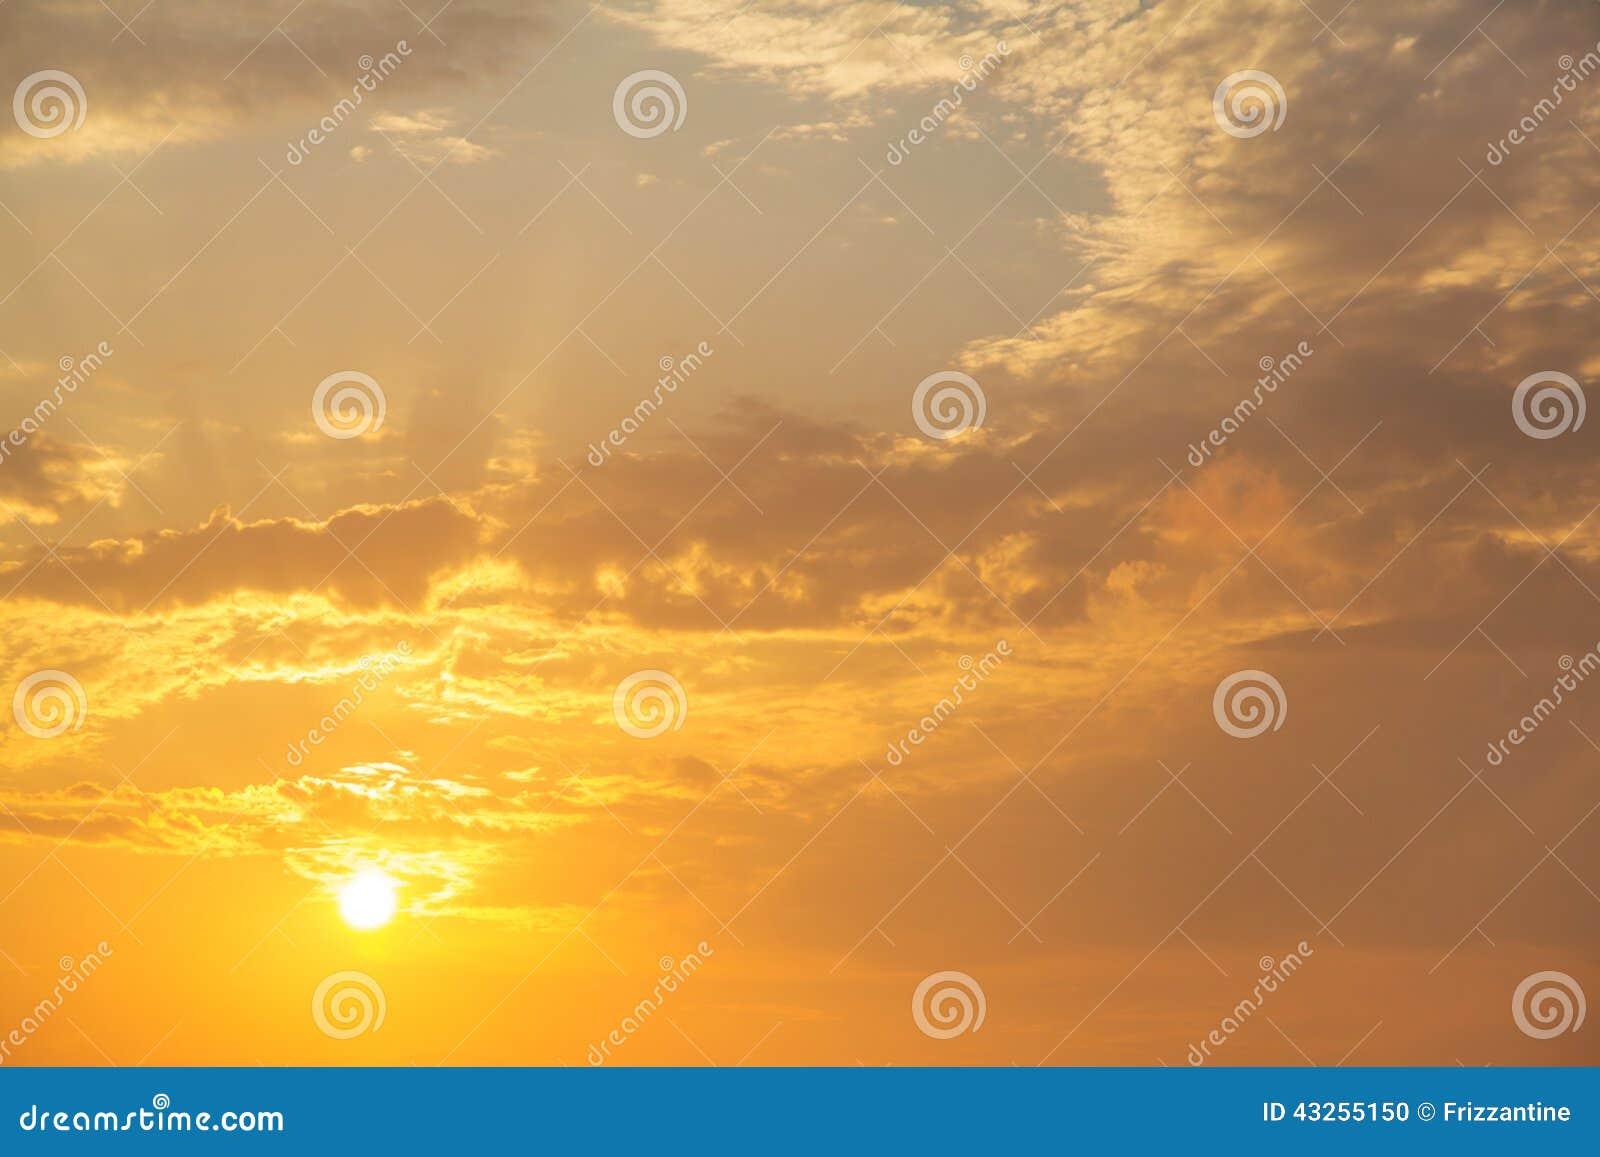 Sky Sunset Dreams Sunrise On Cloudy Background Stock